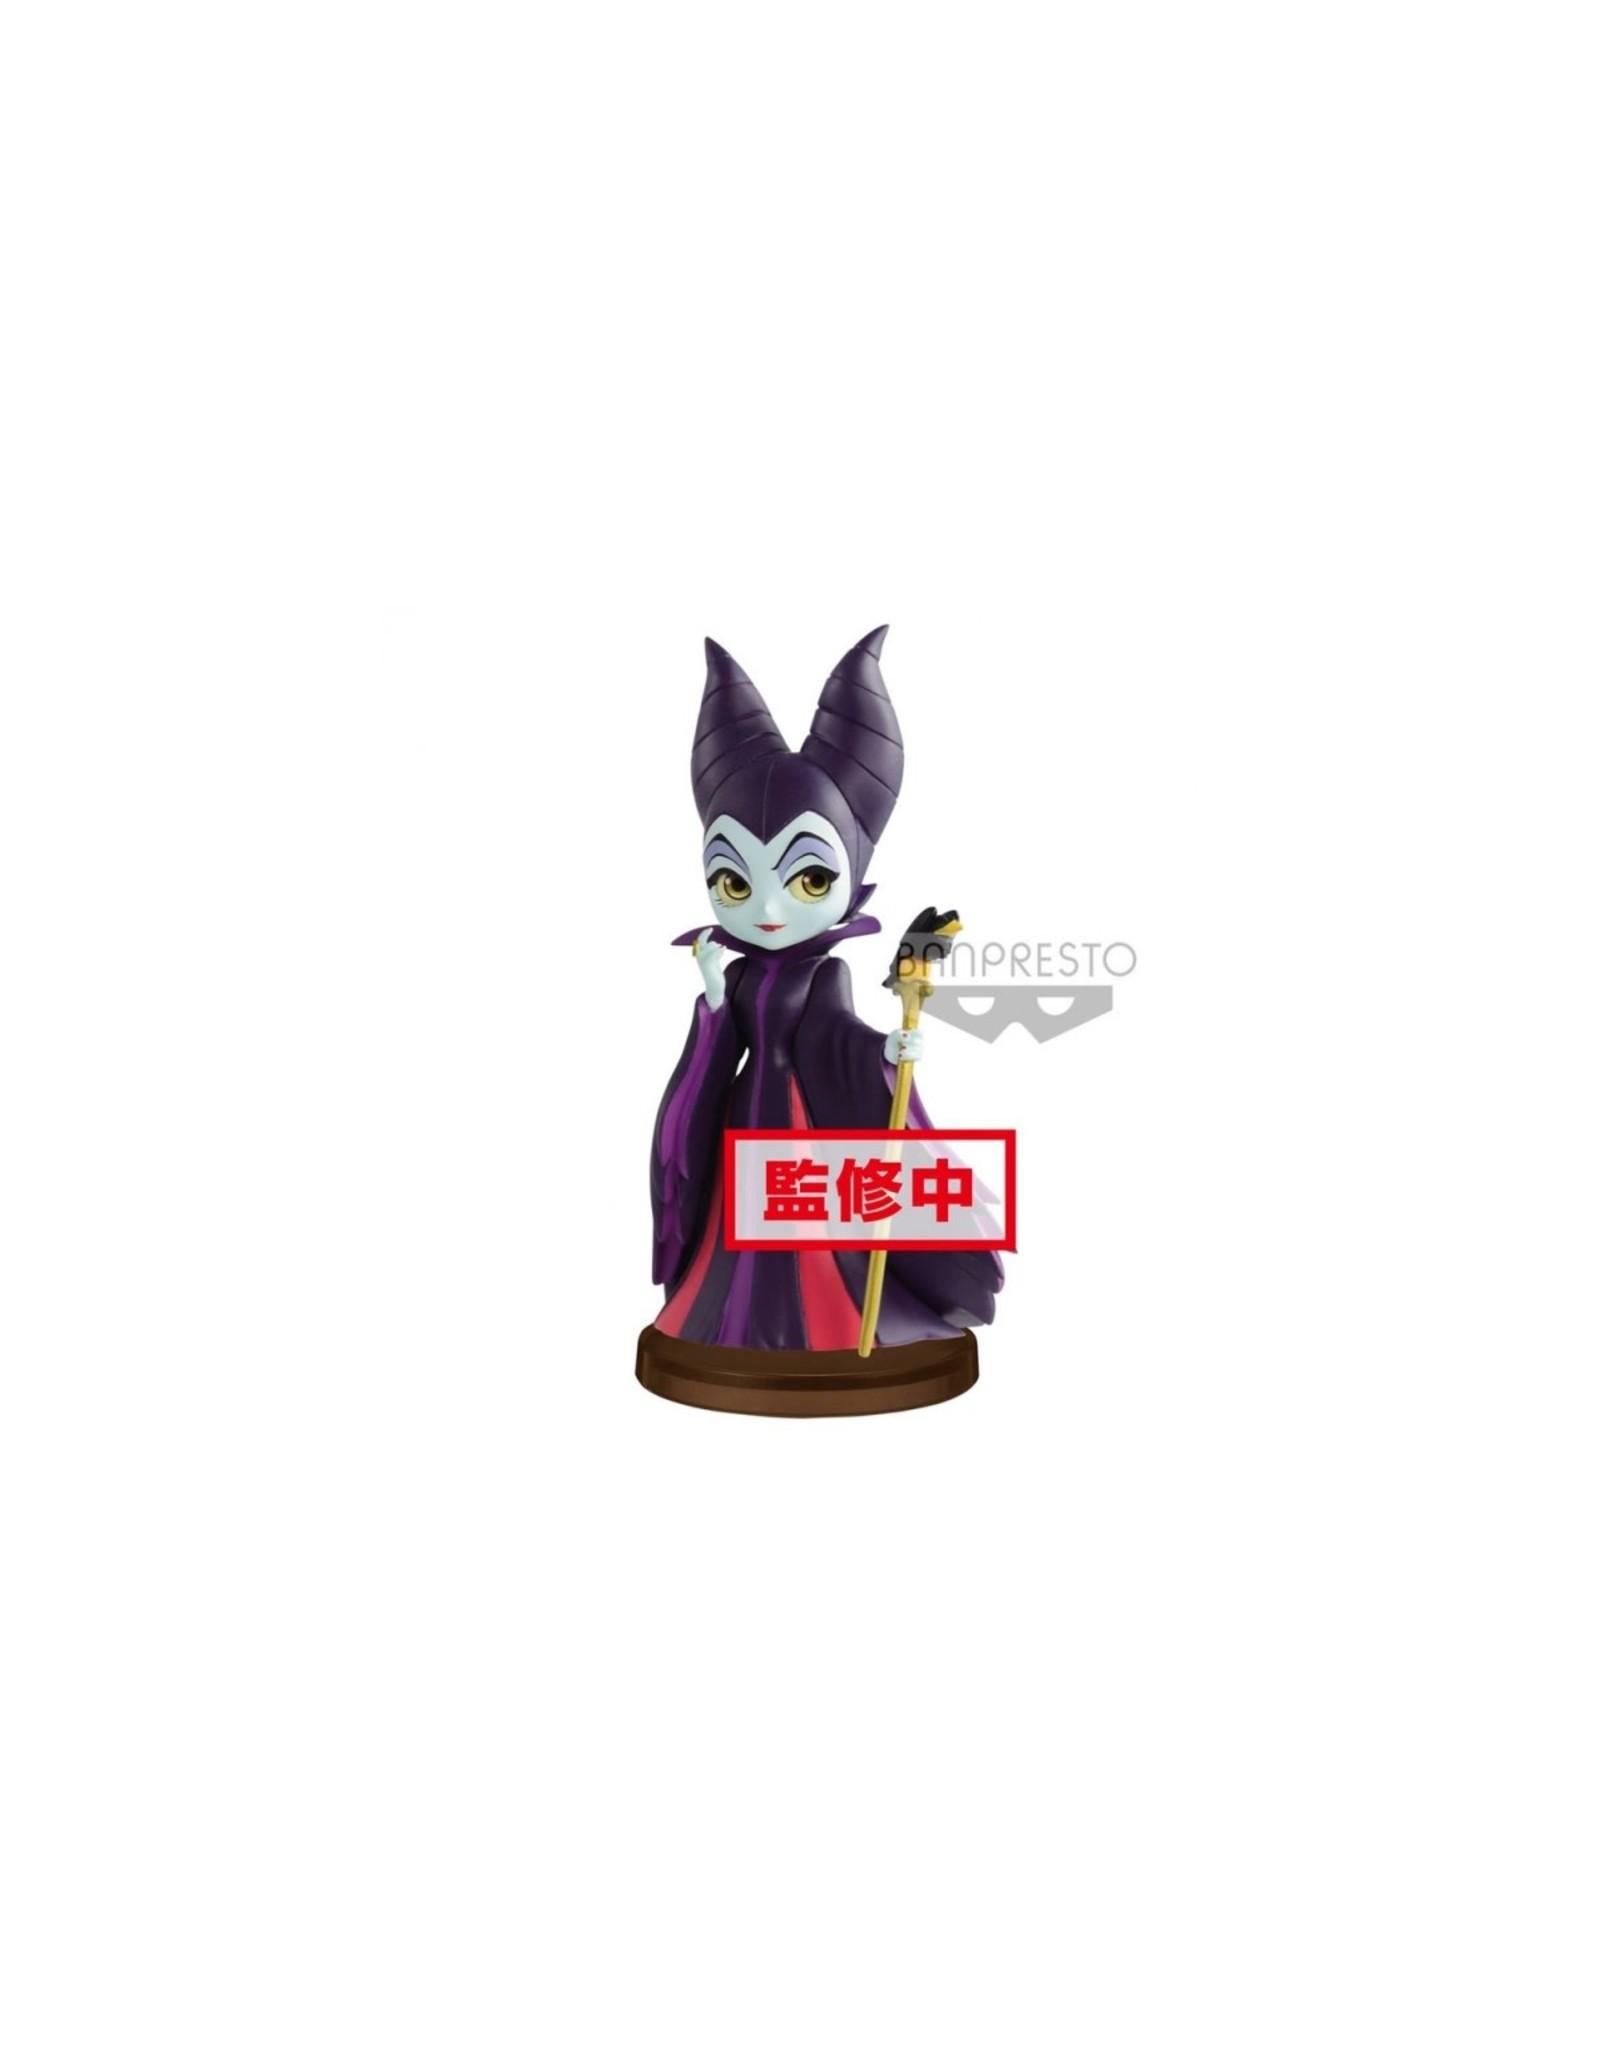 DISNEY - Q Posket Mini Girls Villains - Maleficent - 7cm